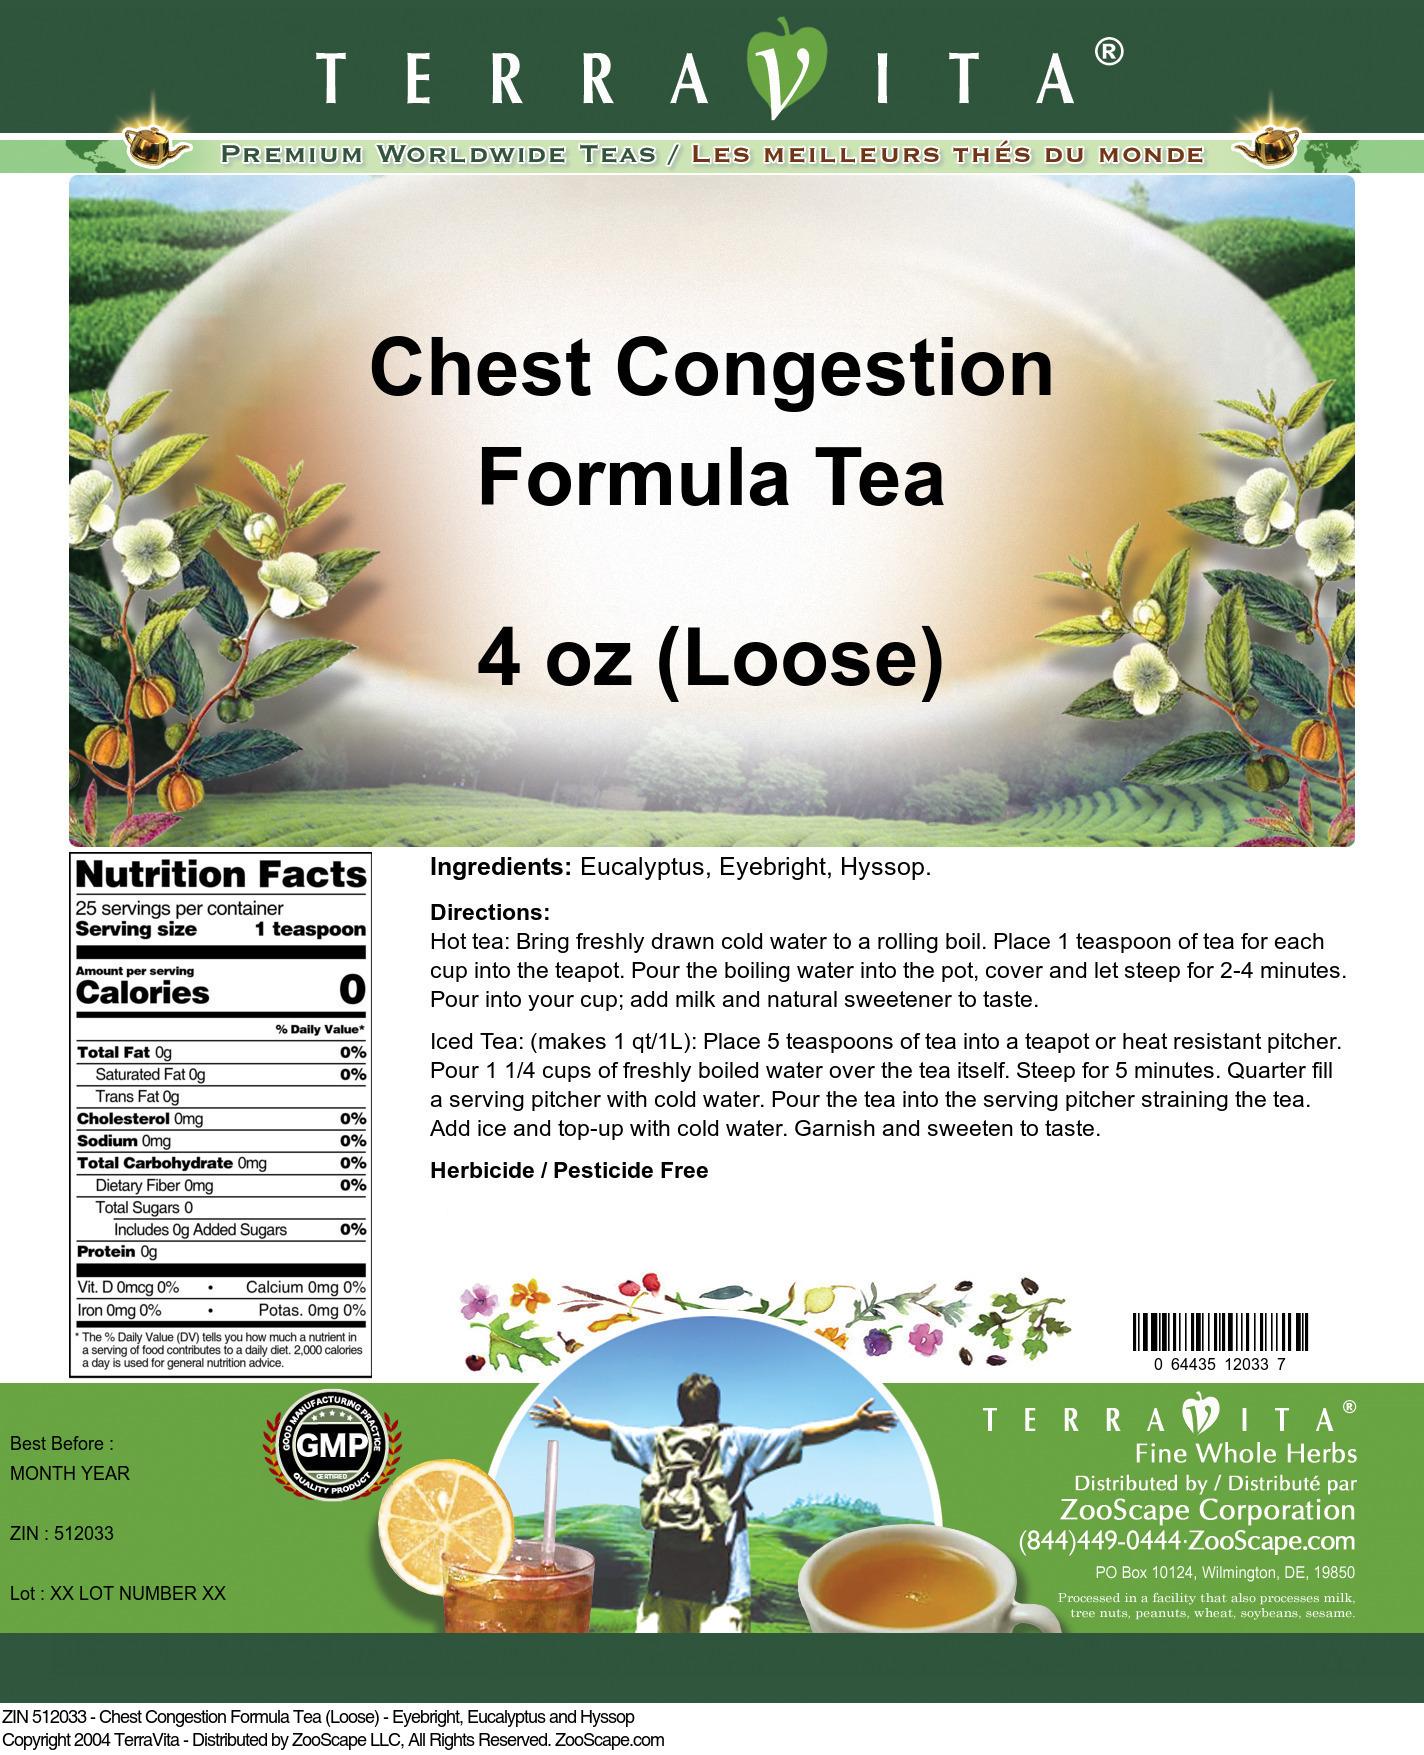 Chest Congestion Formula Tea (Loose) - Eyebright, Eucalyptus and Hyssop